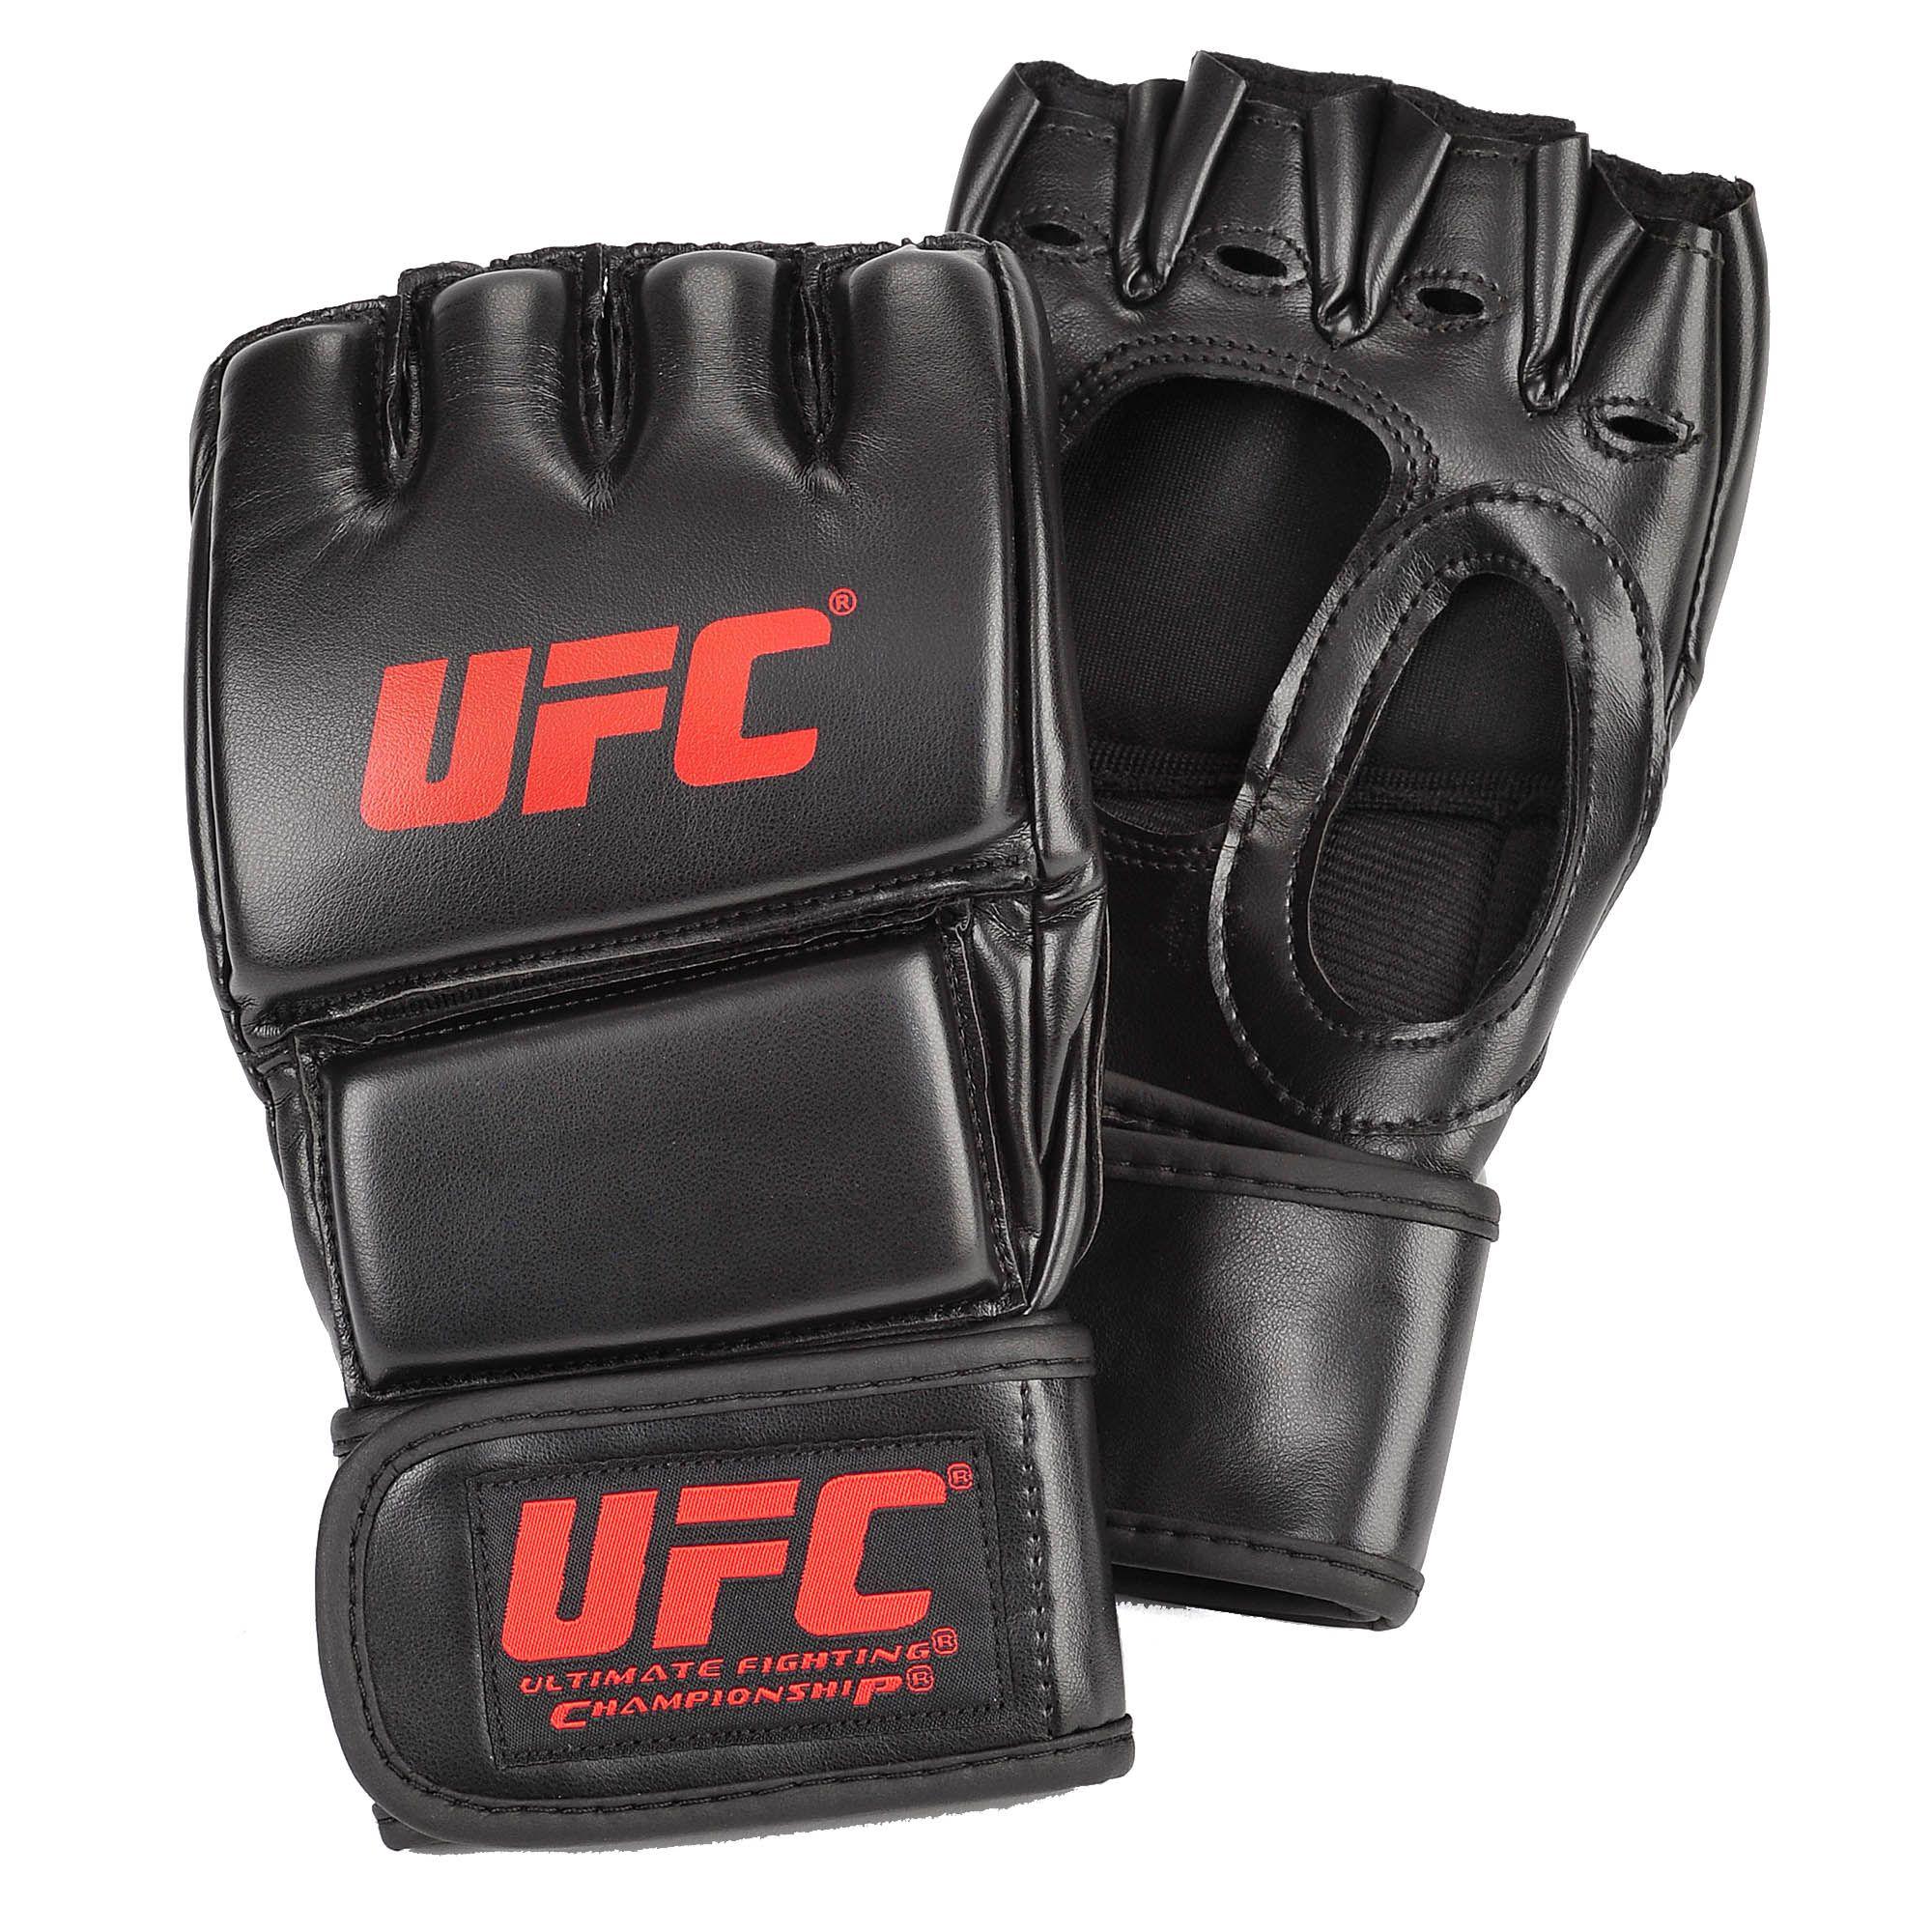 Mma Fitness Gear Equipment Home: UFC Training Gloves